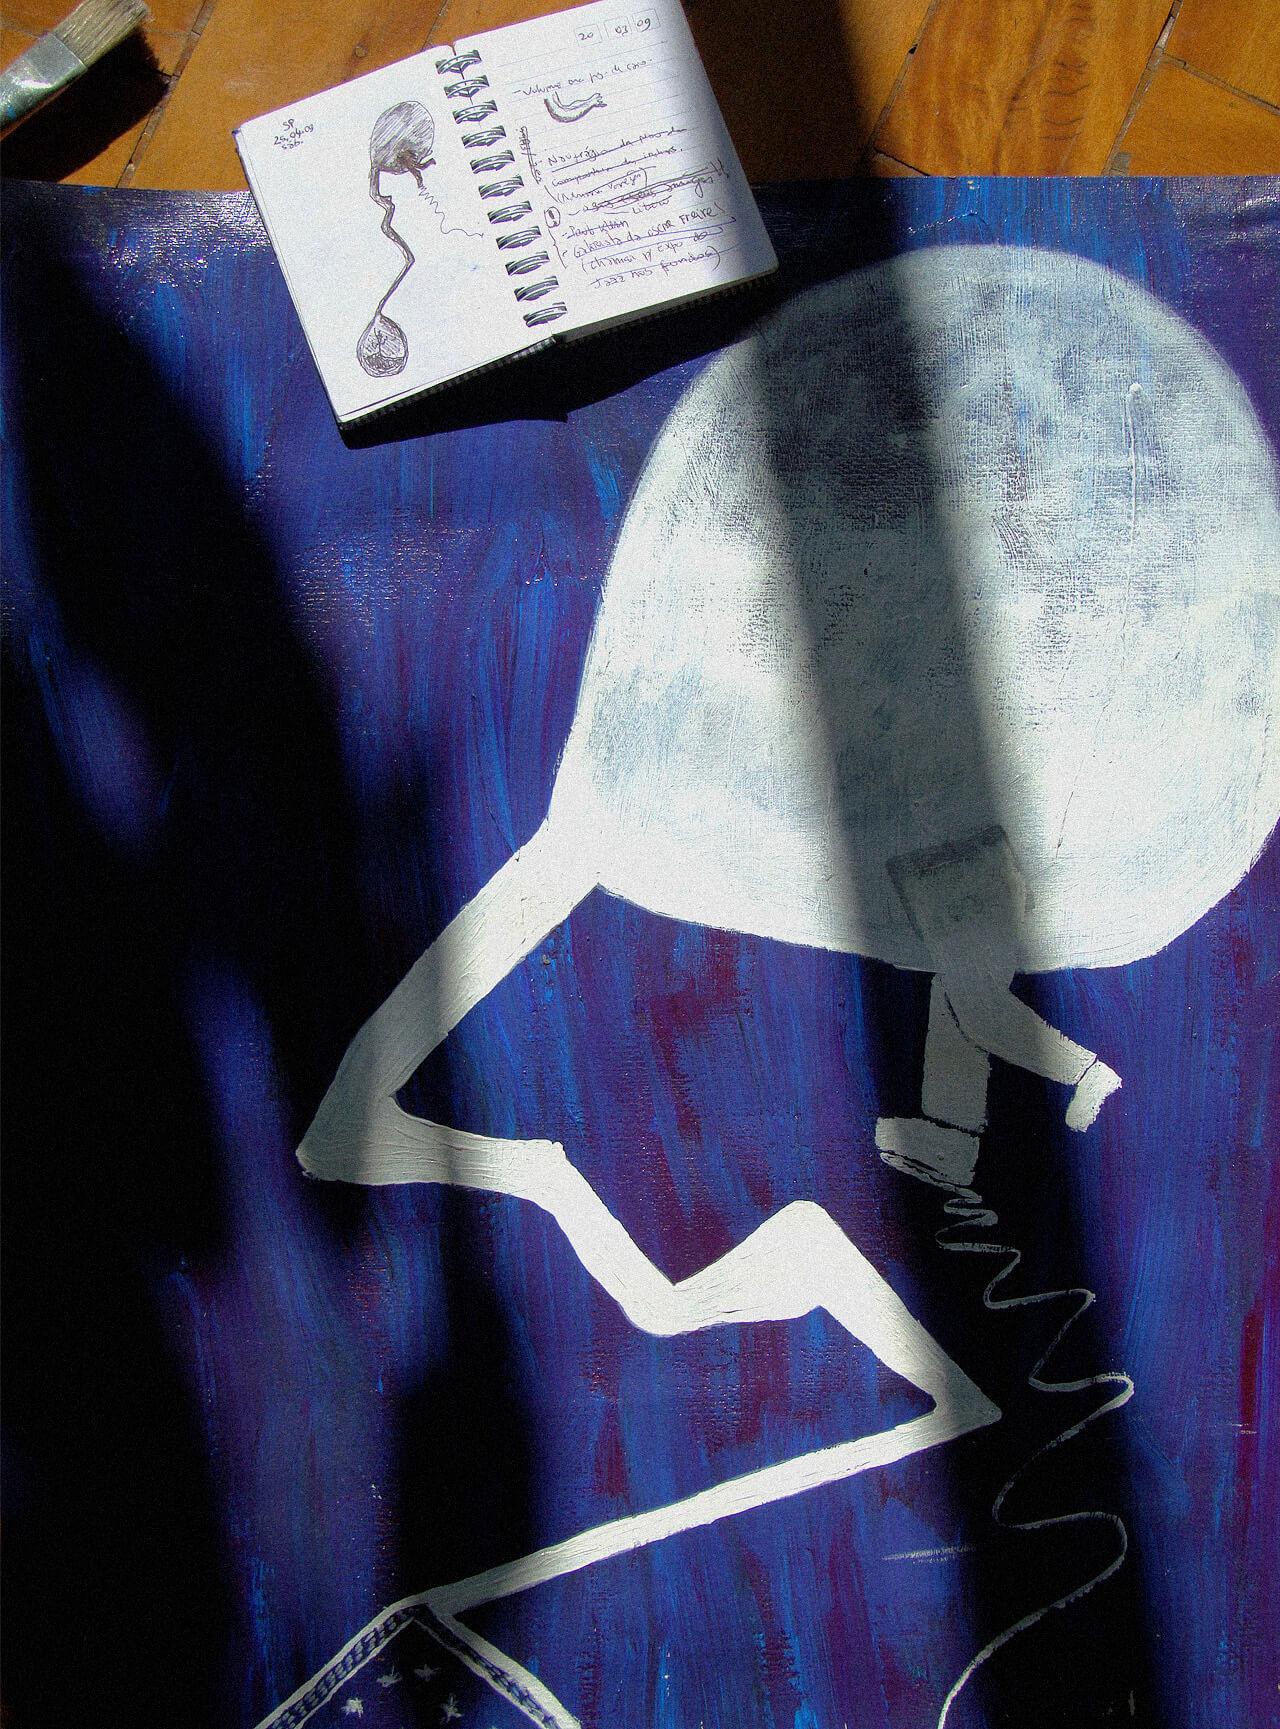 ART_ILLUSTR-paintings_piedealato_sights_of_life-img-20